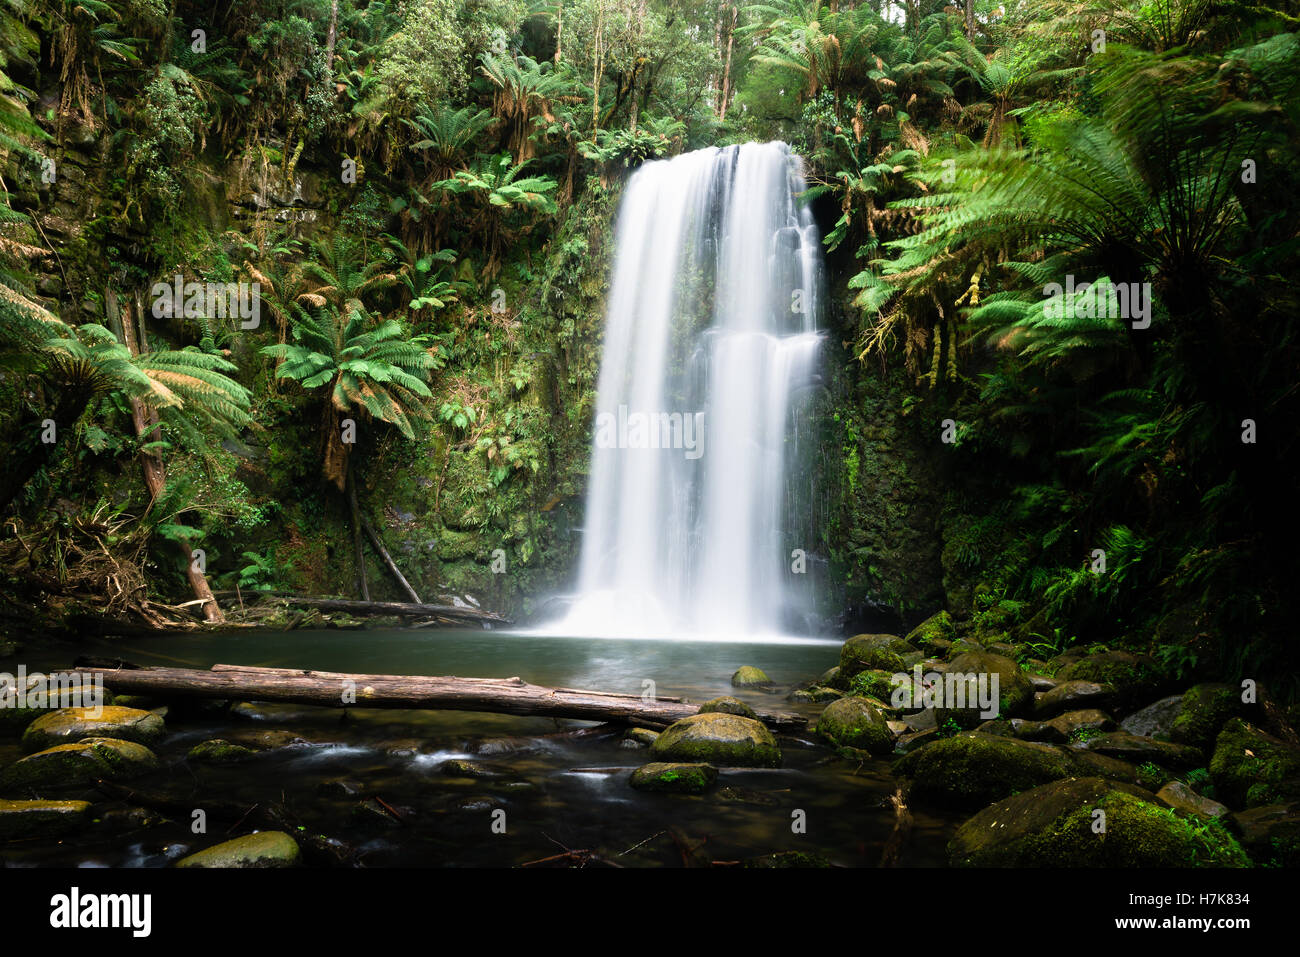 Beauchamp Falls, Great Otway National Park, Victoria, Australia - Stock Image